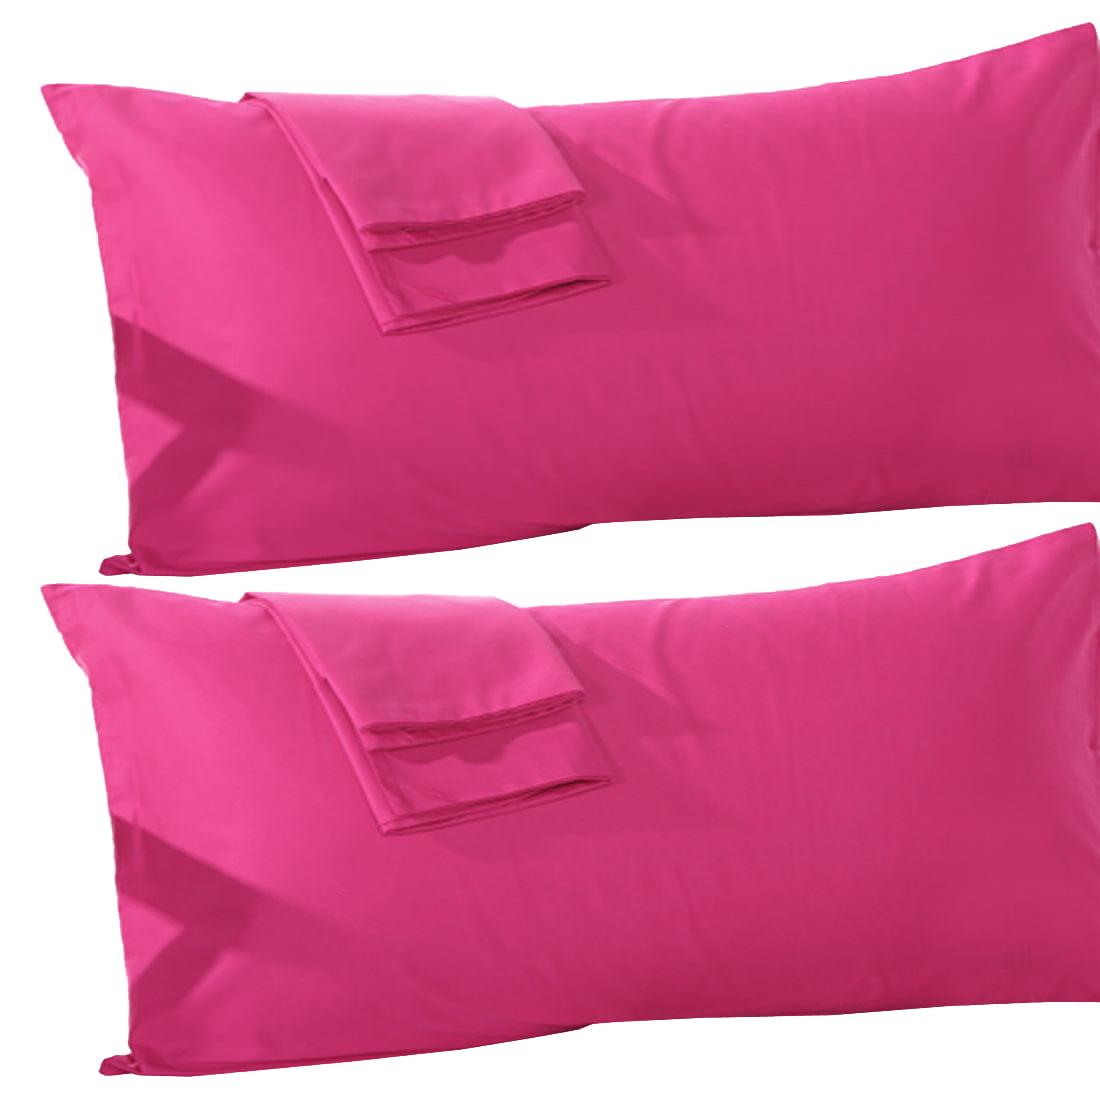 "Unique Bargains 2 Pack, 20"" x 55"" Body Pillowcase Pillow Case Cover Egyptian Cotton, Body Pillow Cover Sliver"